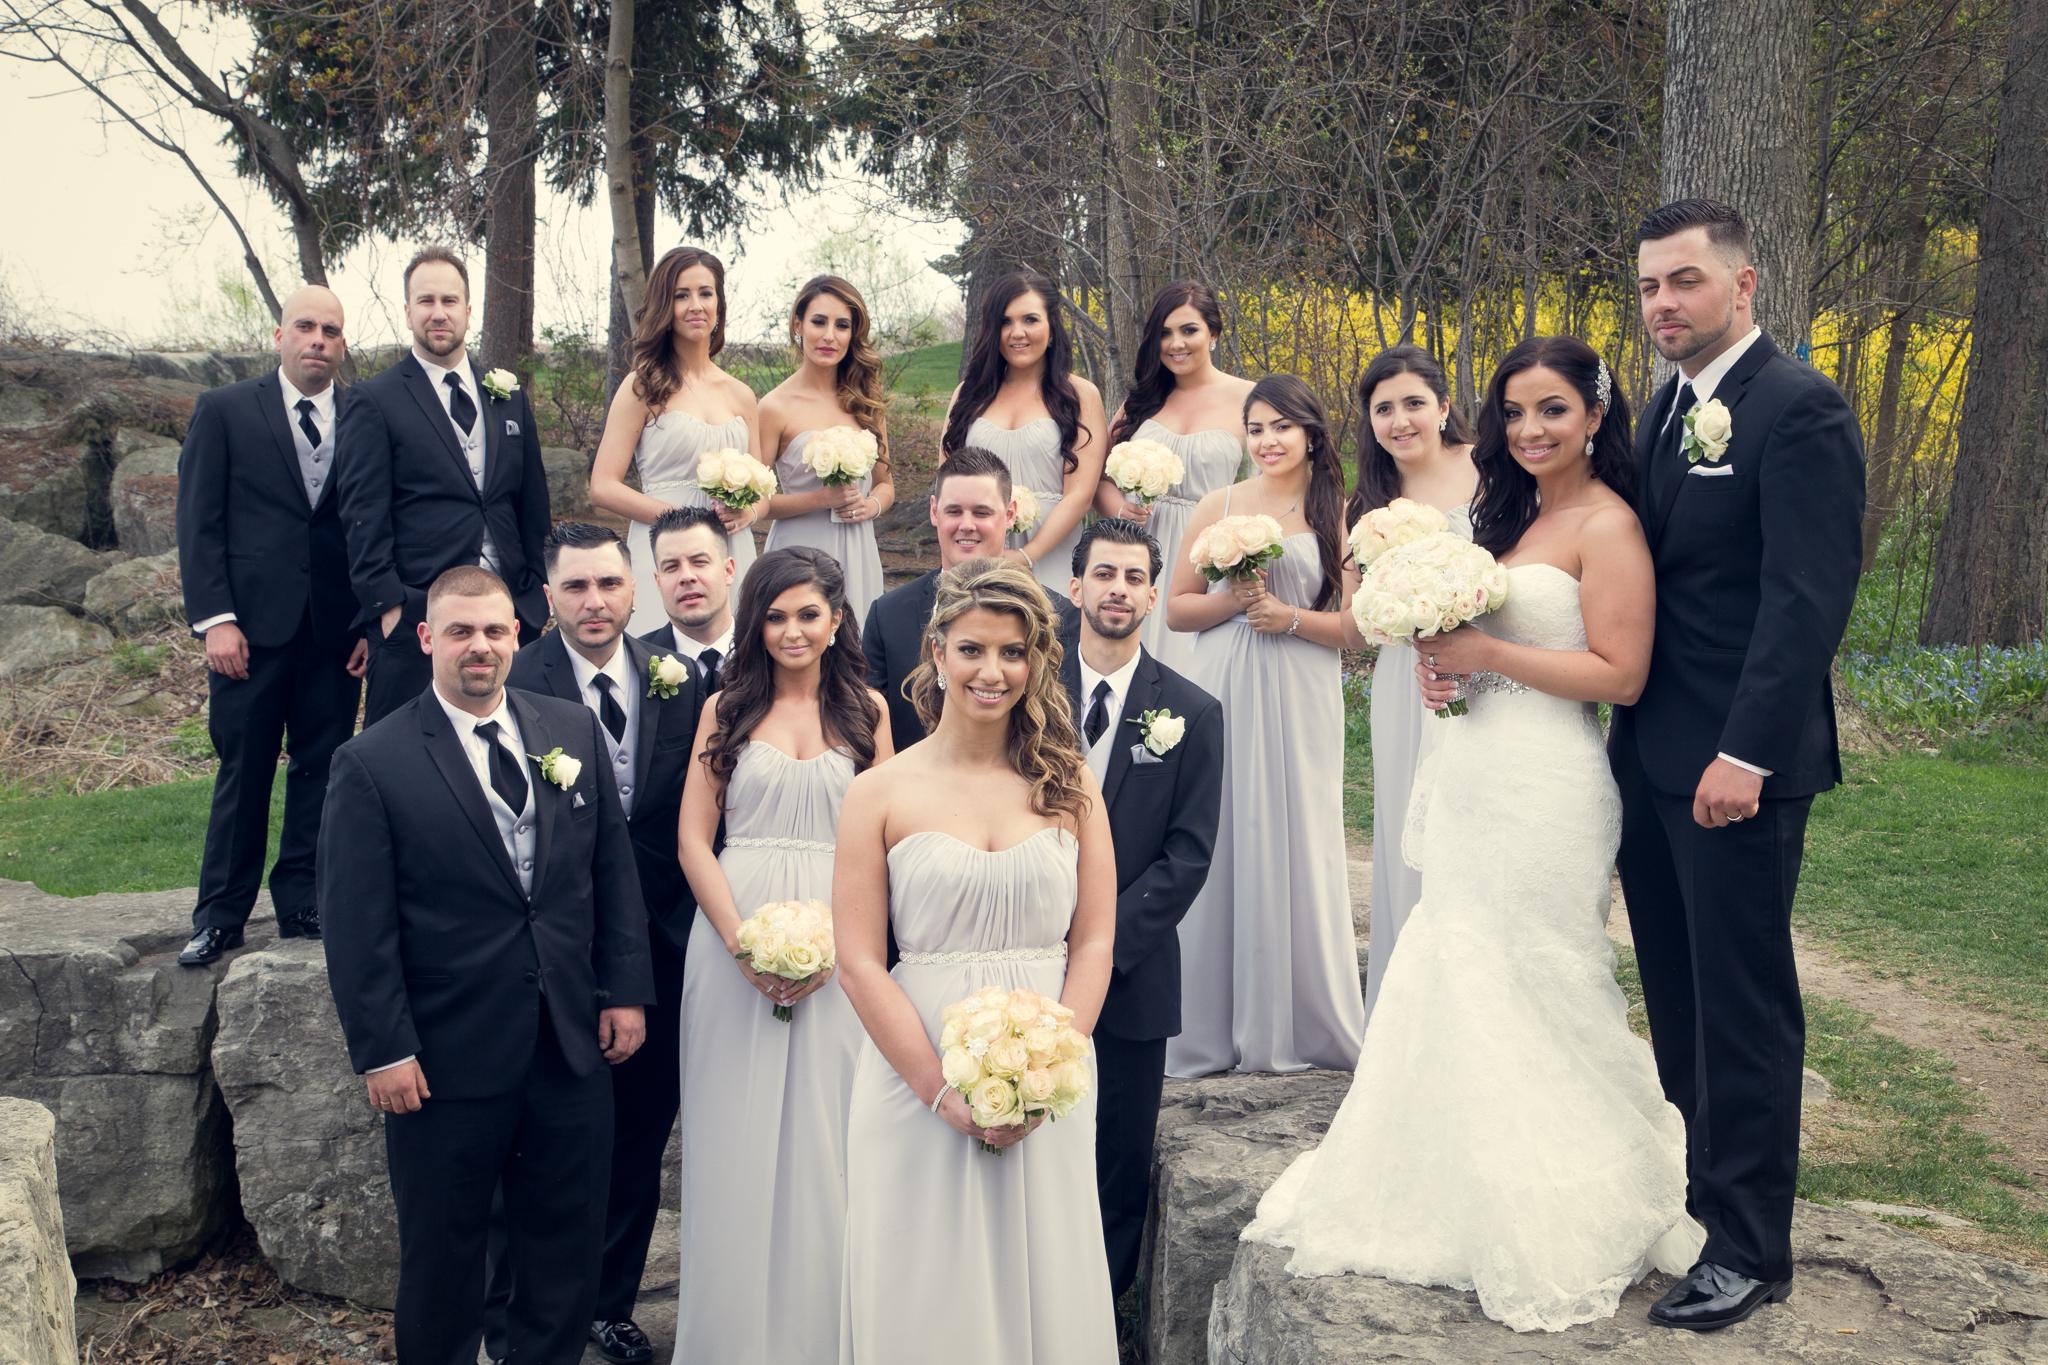 Mississauga_Grand_Wedding_Photography-71